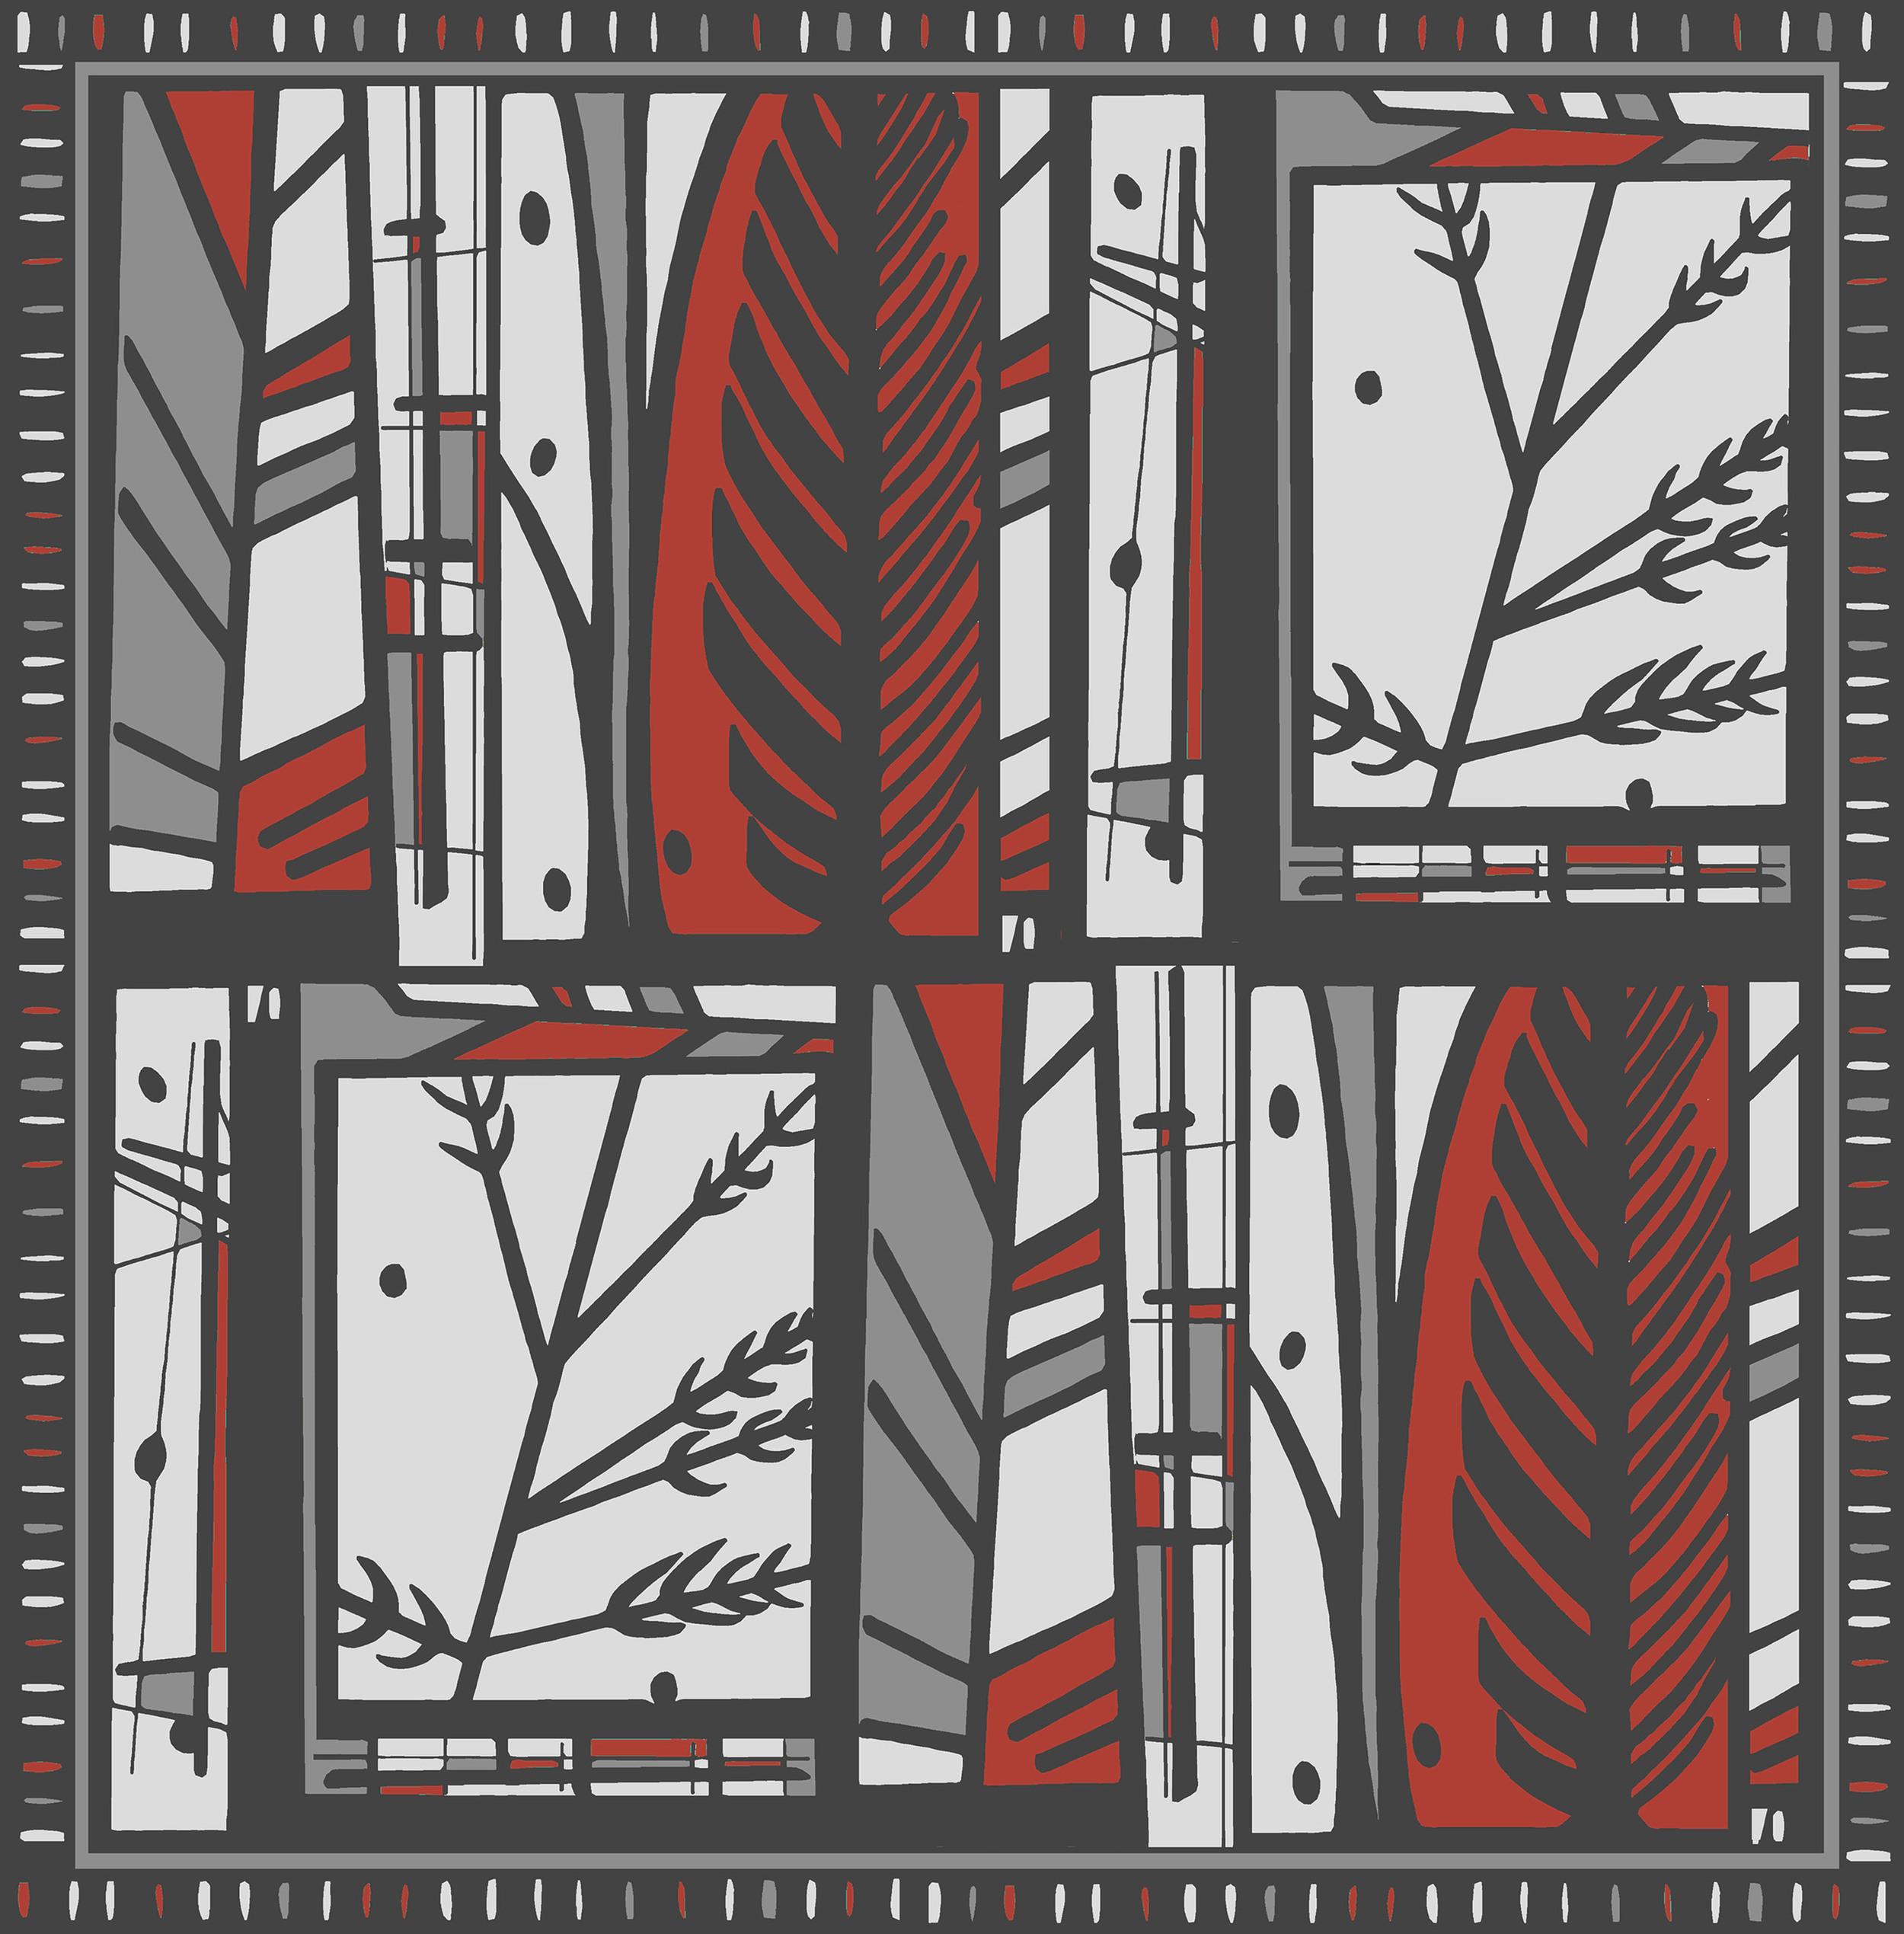 Forest design red